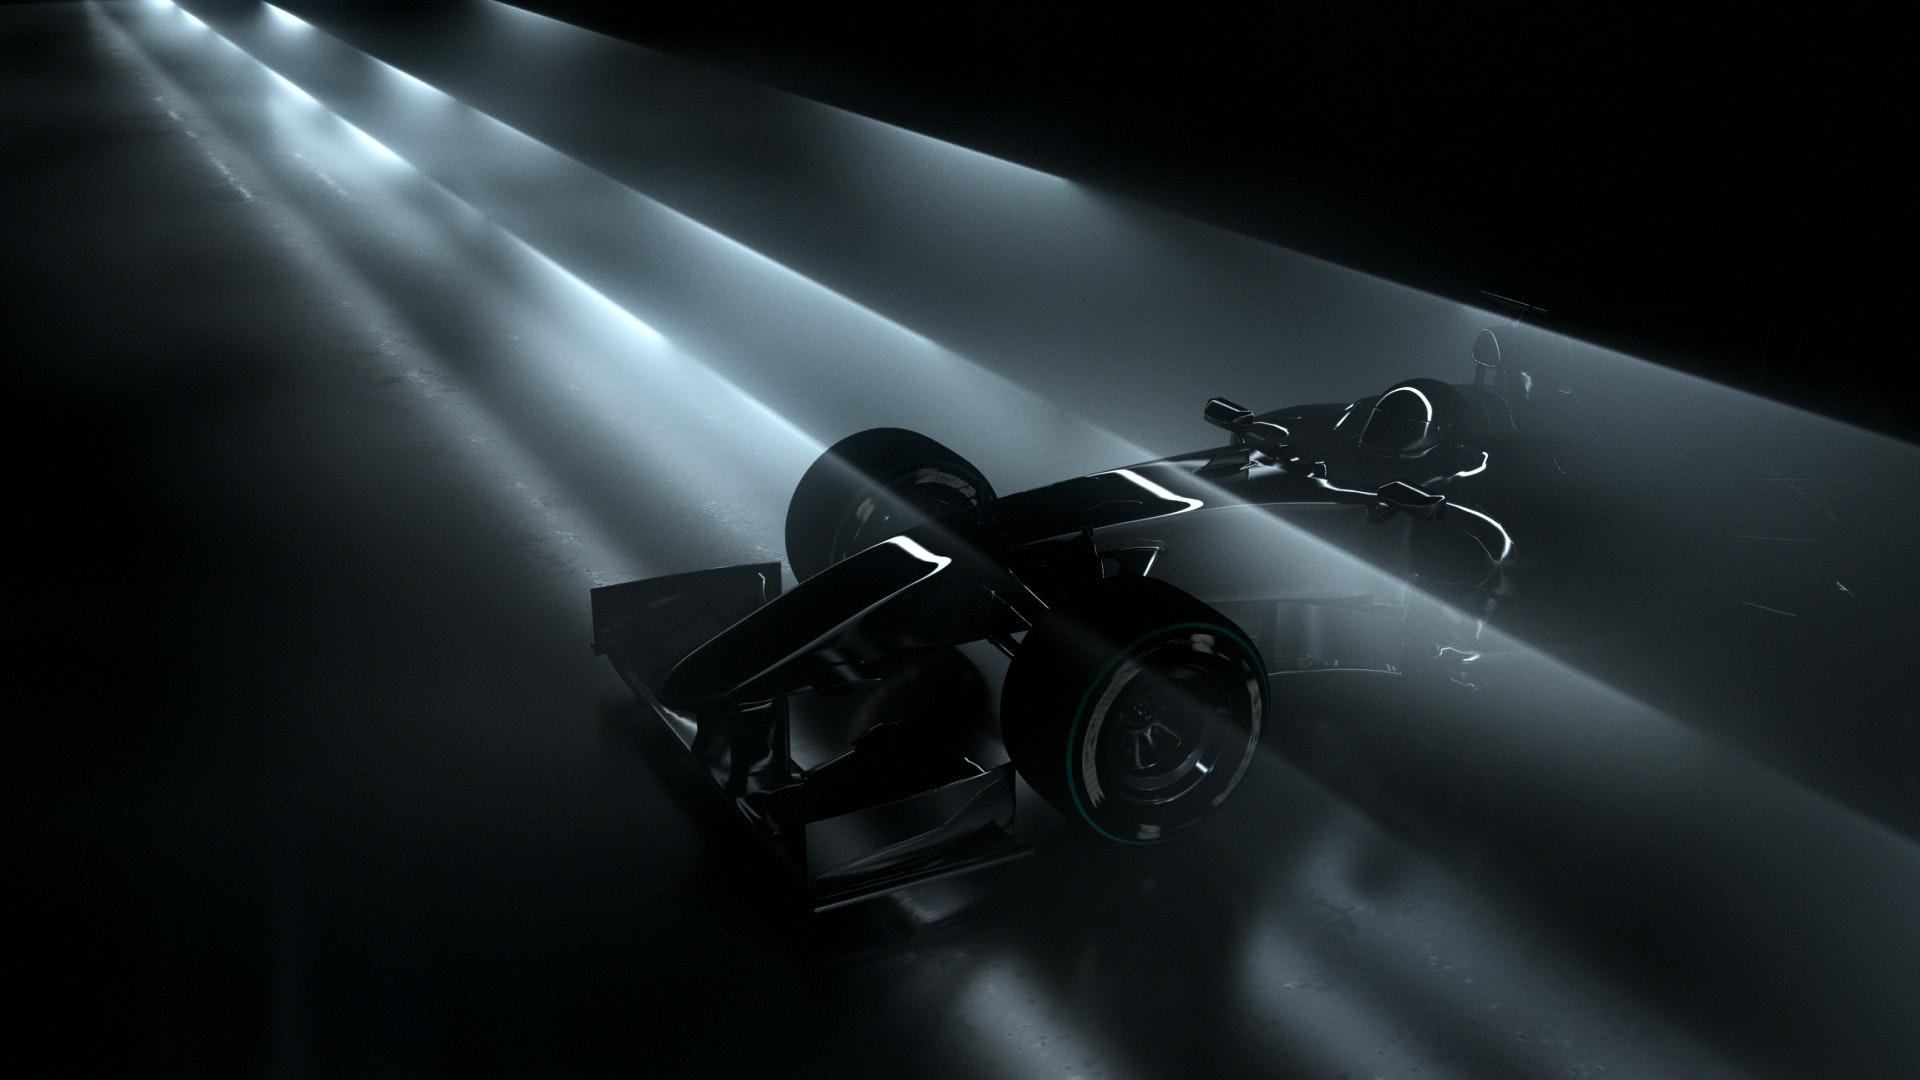 VINICIUS NALDI - Nike_Mercurial_Design_Naldi_BW_1 (0-00-01-00)